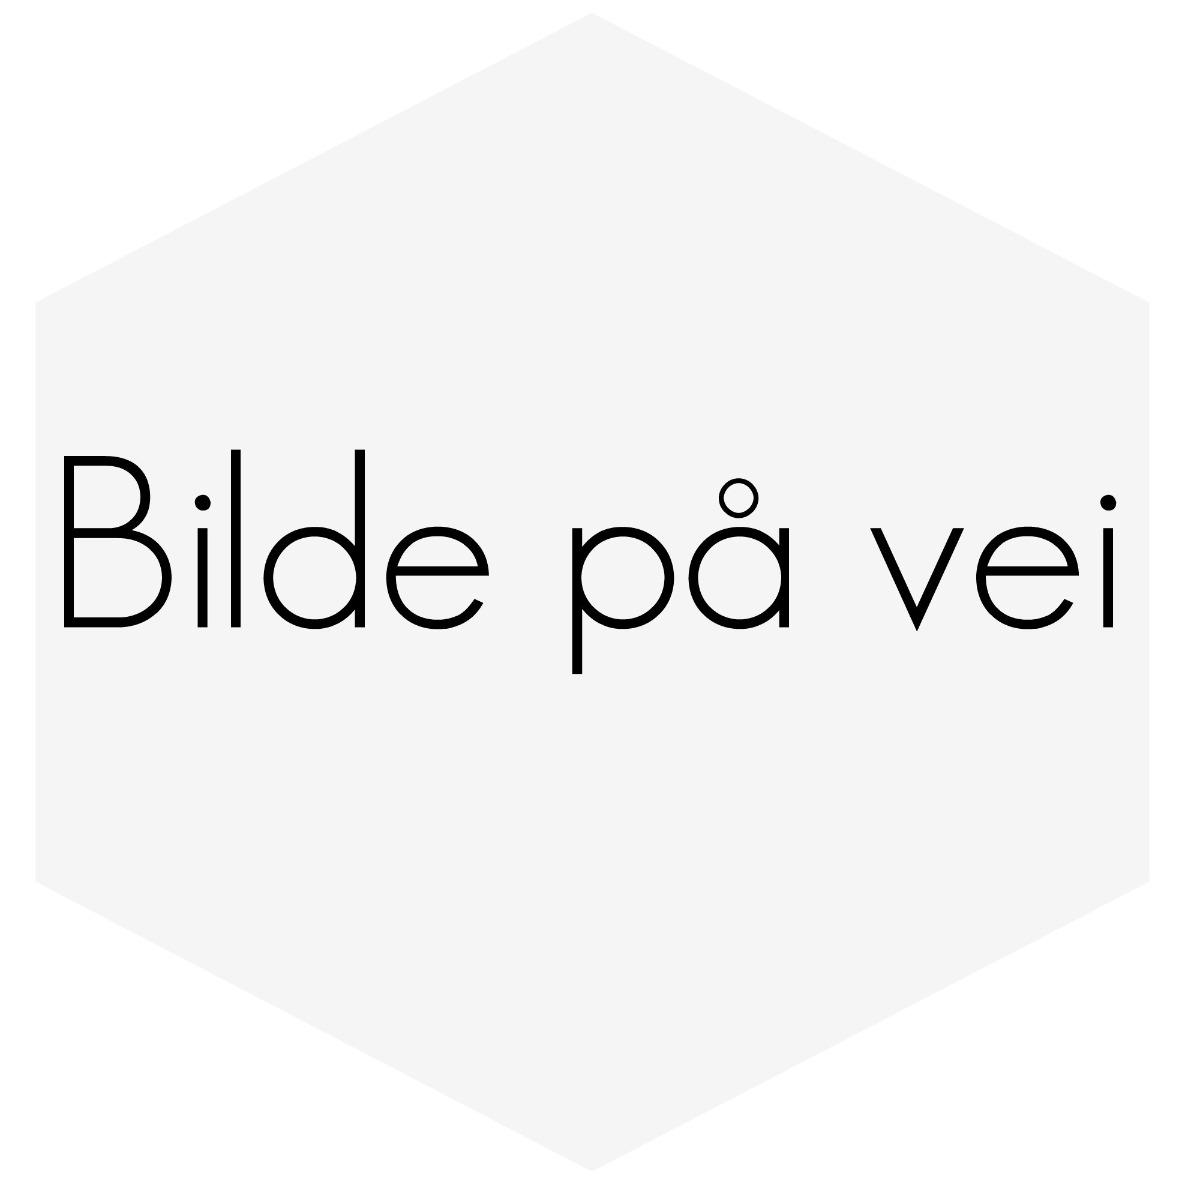 "SILIKONSLANGE RØD REDUSERING 3,5-4"" (89-102MM)"